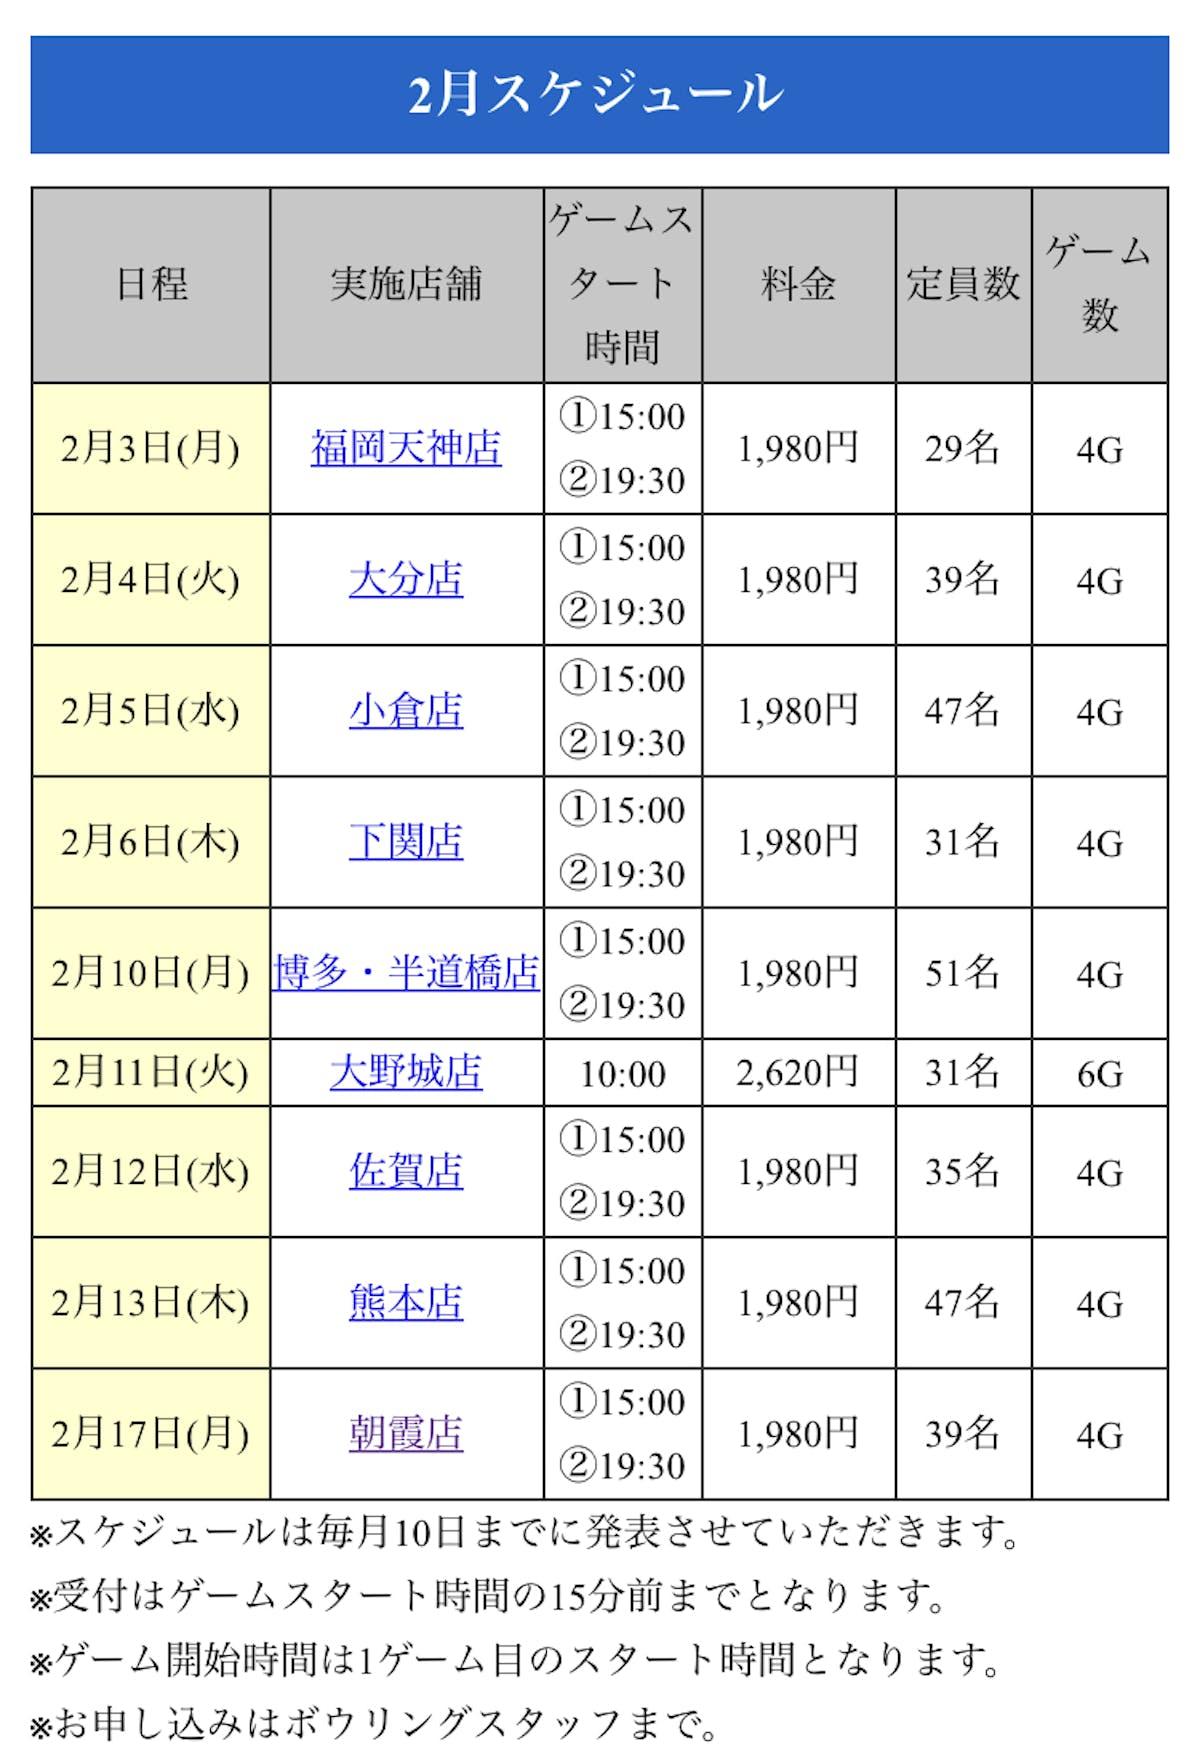 631E7FC1-6B51-4CAB-B6F3-B6187D28C844.jpeg